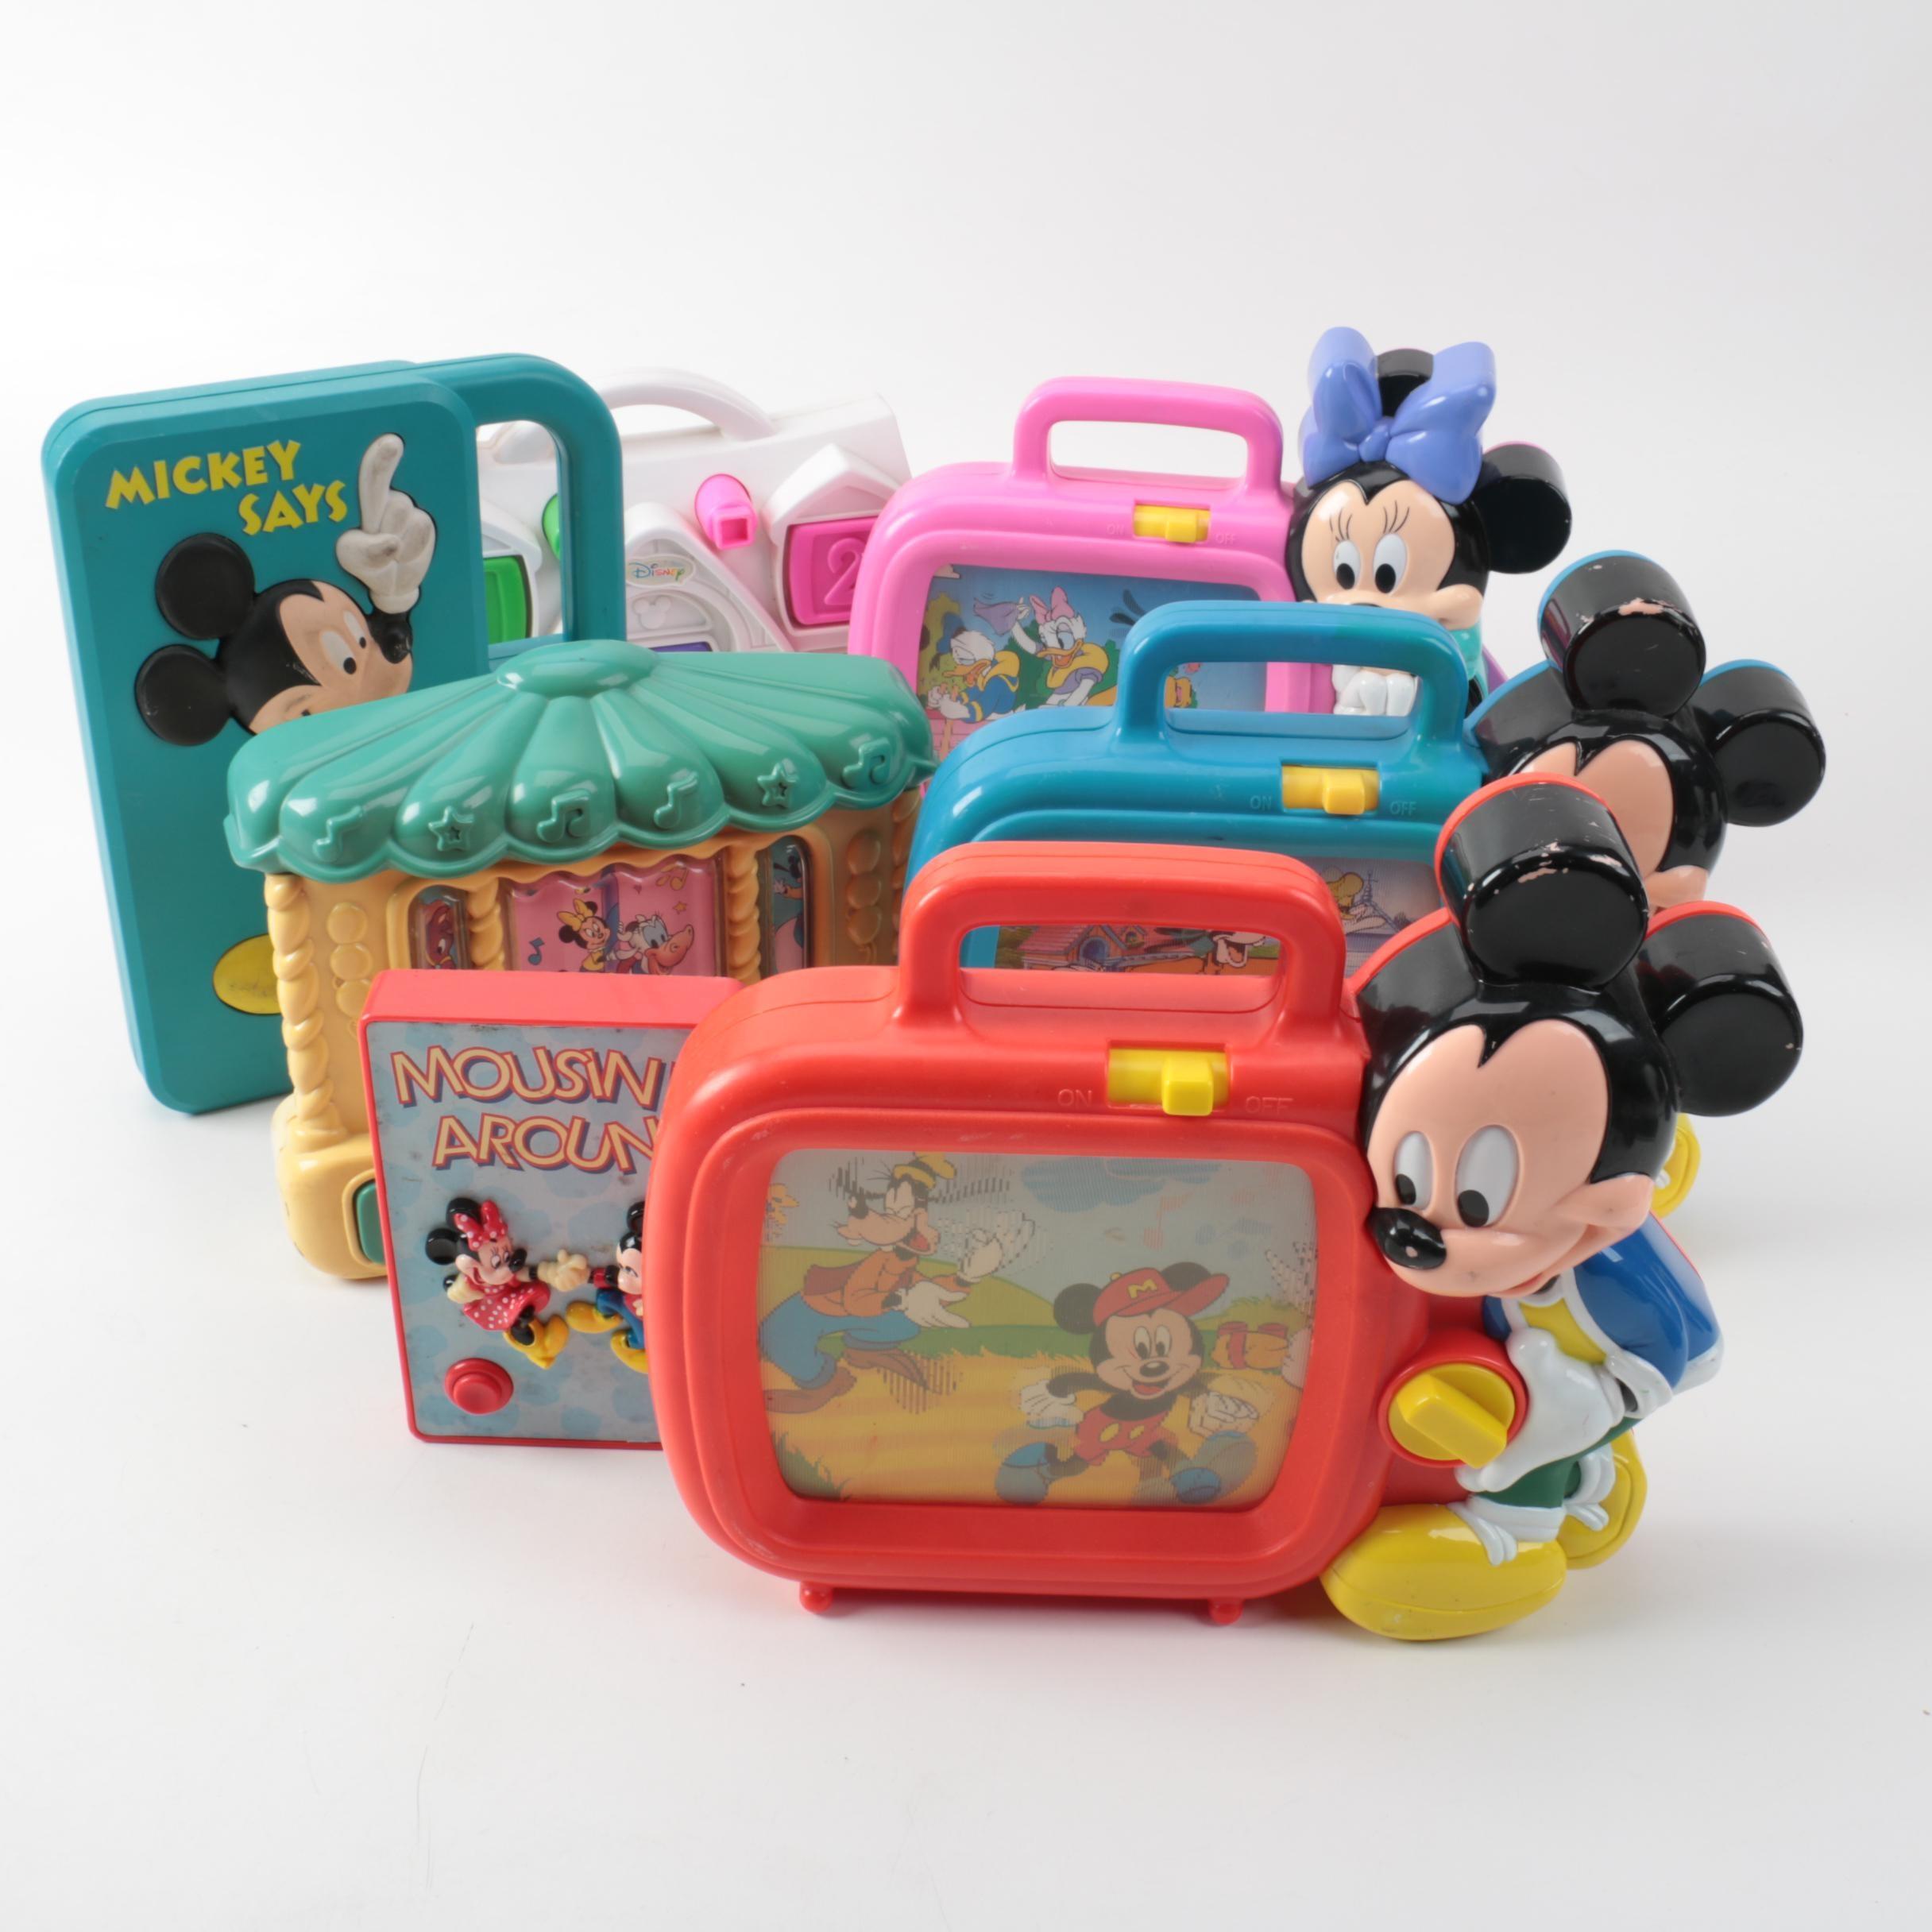 Vintage Disney Electronic Toys